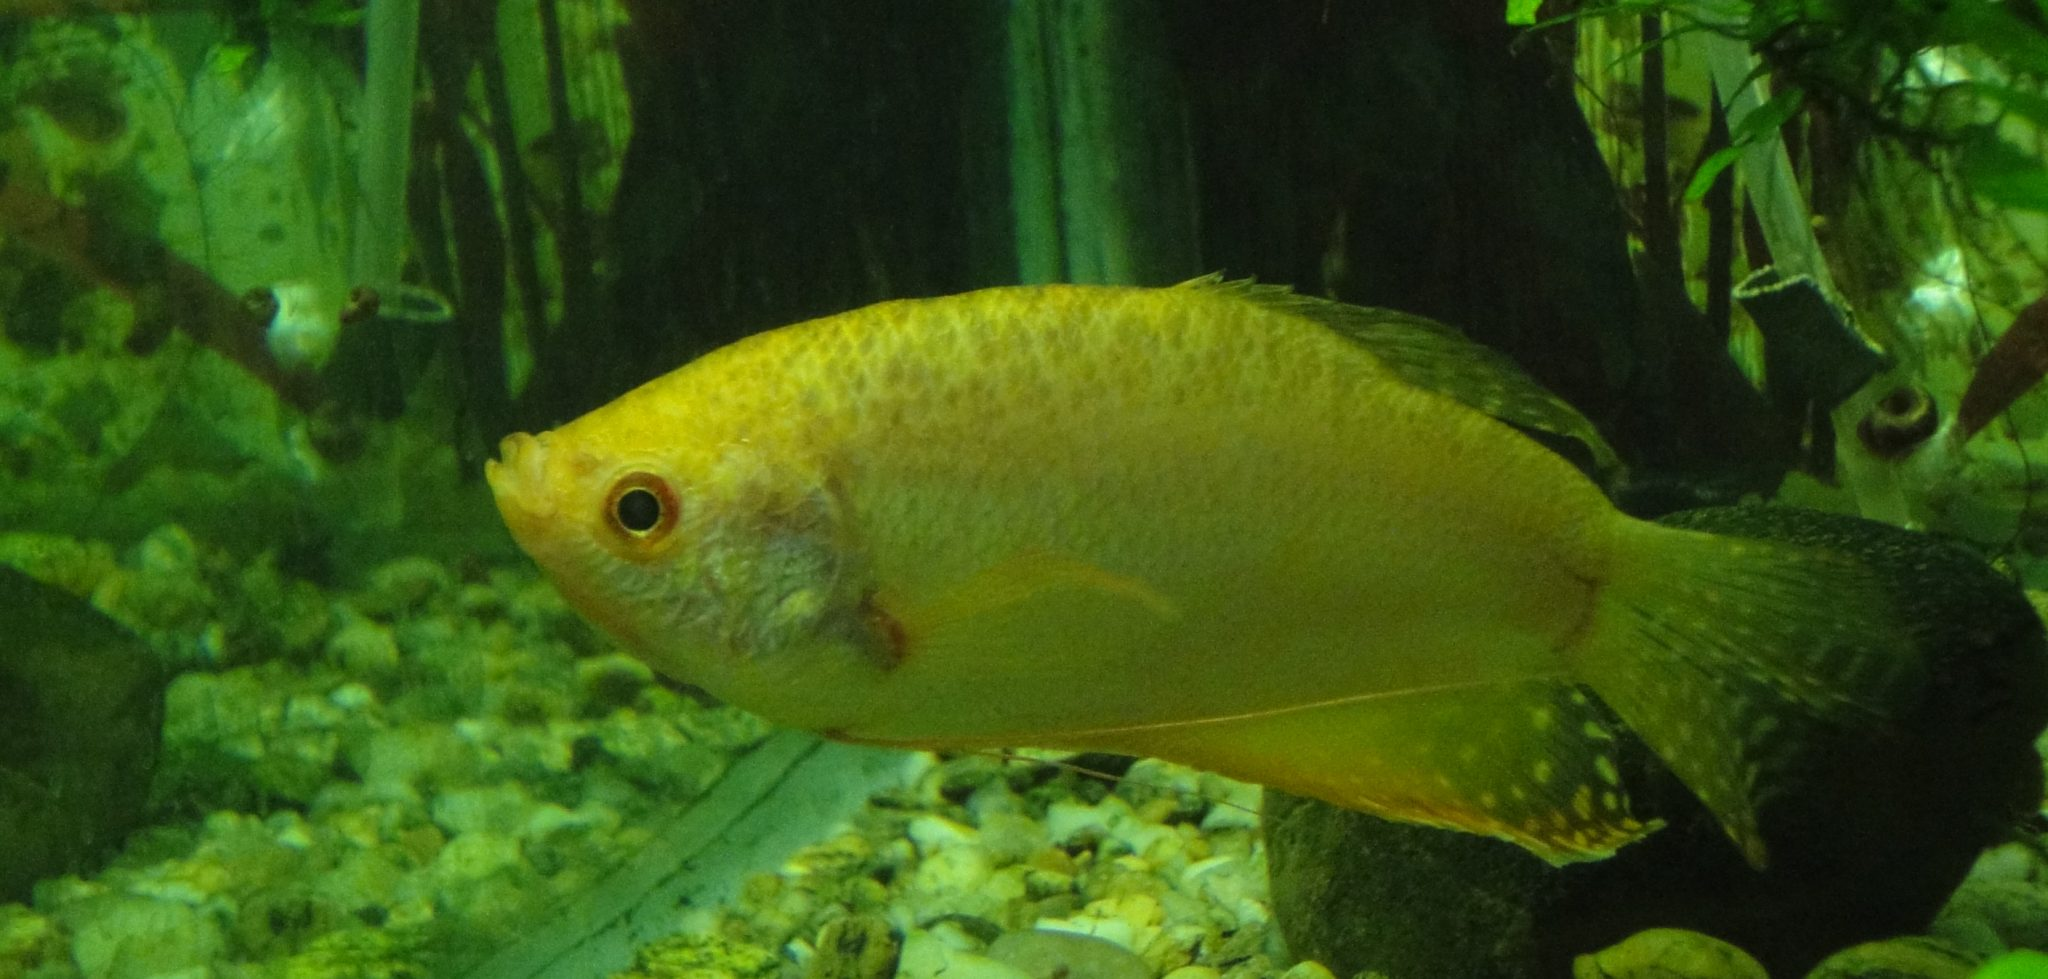 Three-spot Gourami, Labrus trichopterus, Osphromenus siamensis, Stethochaetus biguttatus, Trichogaster trichopterus, Trichopus sepat